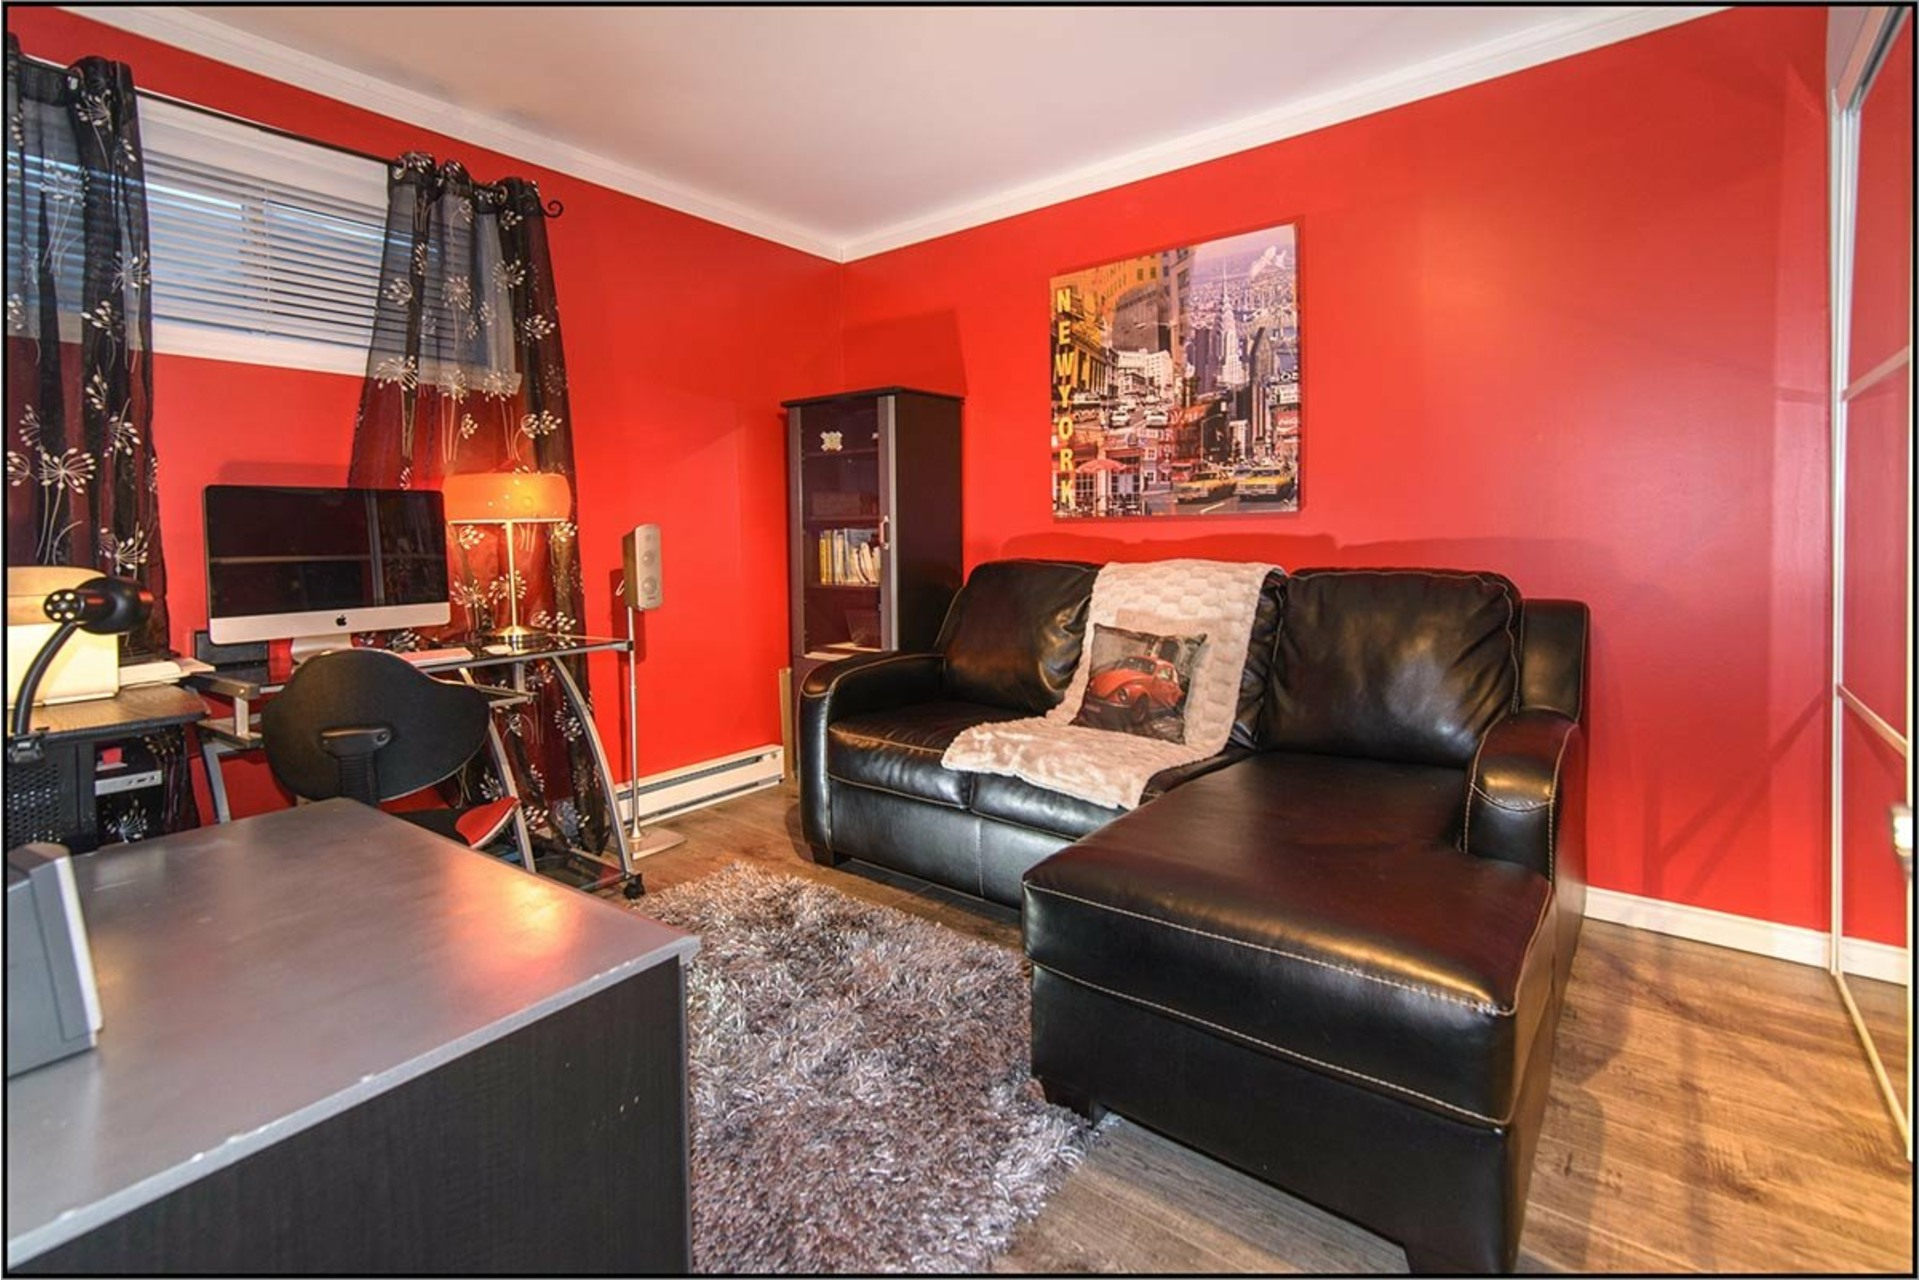 image 16 - House For sale Sainte-Foy/Sillery/Cap-Rouge Québec  - 13 rooms